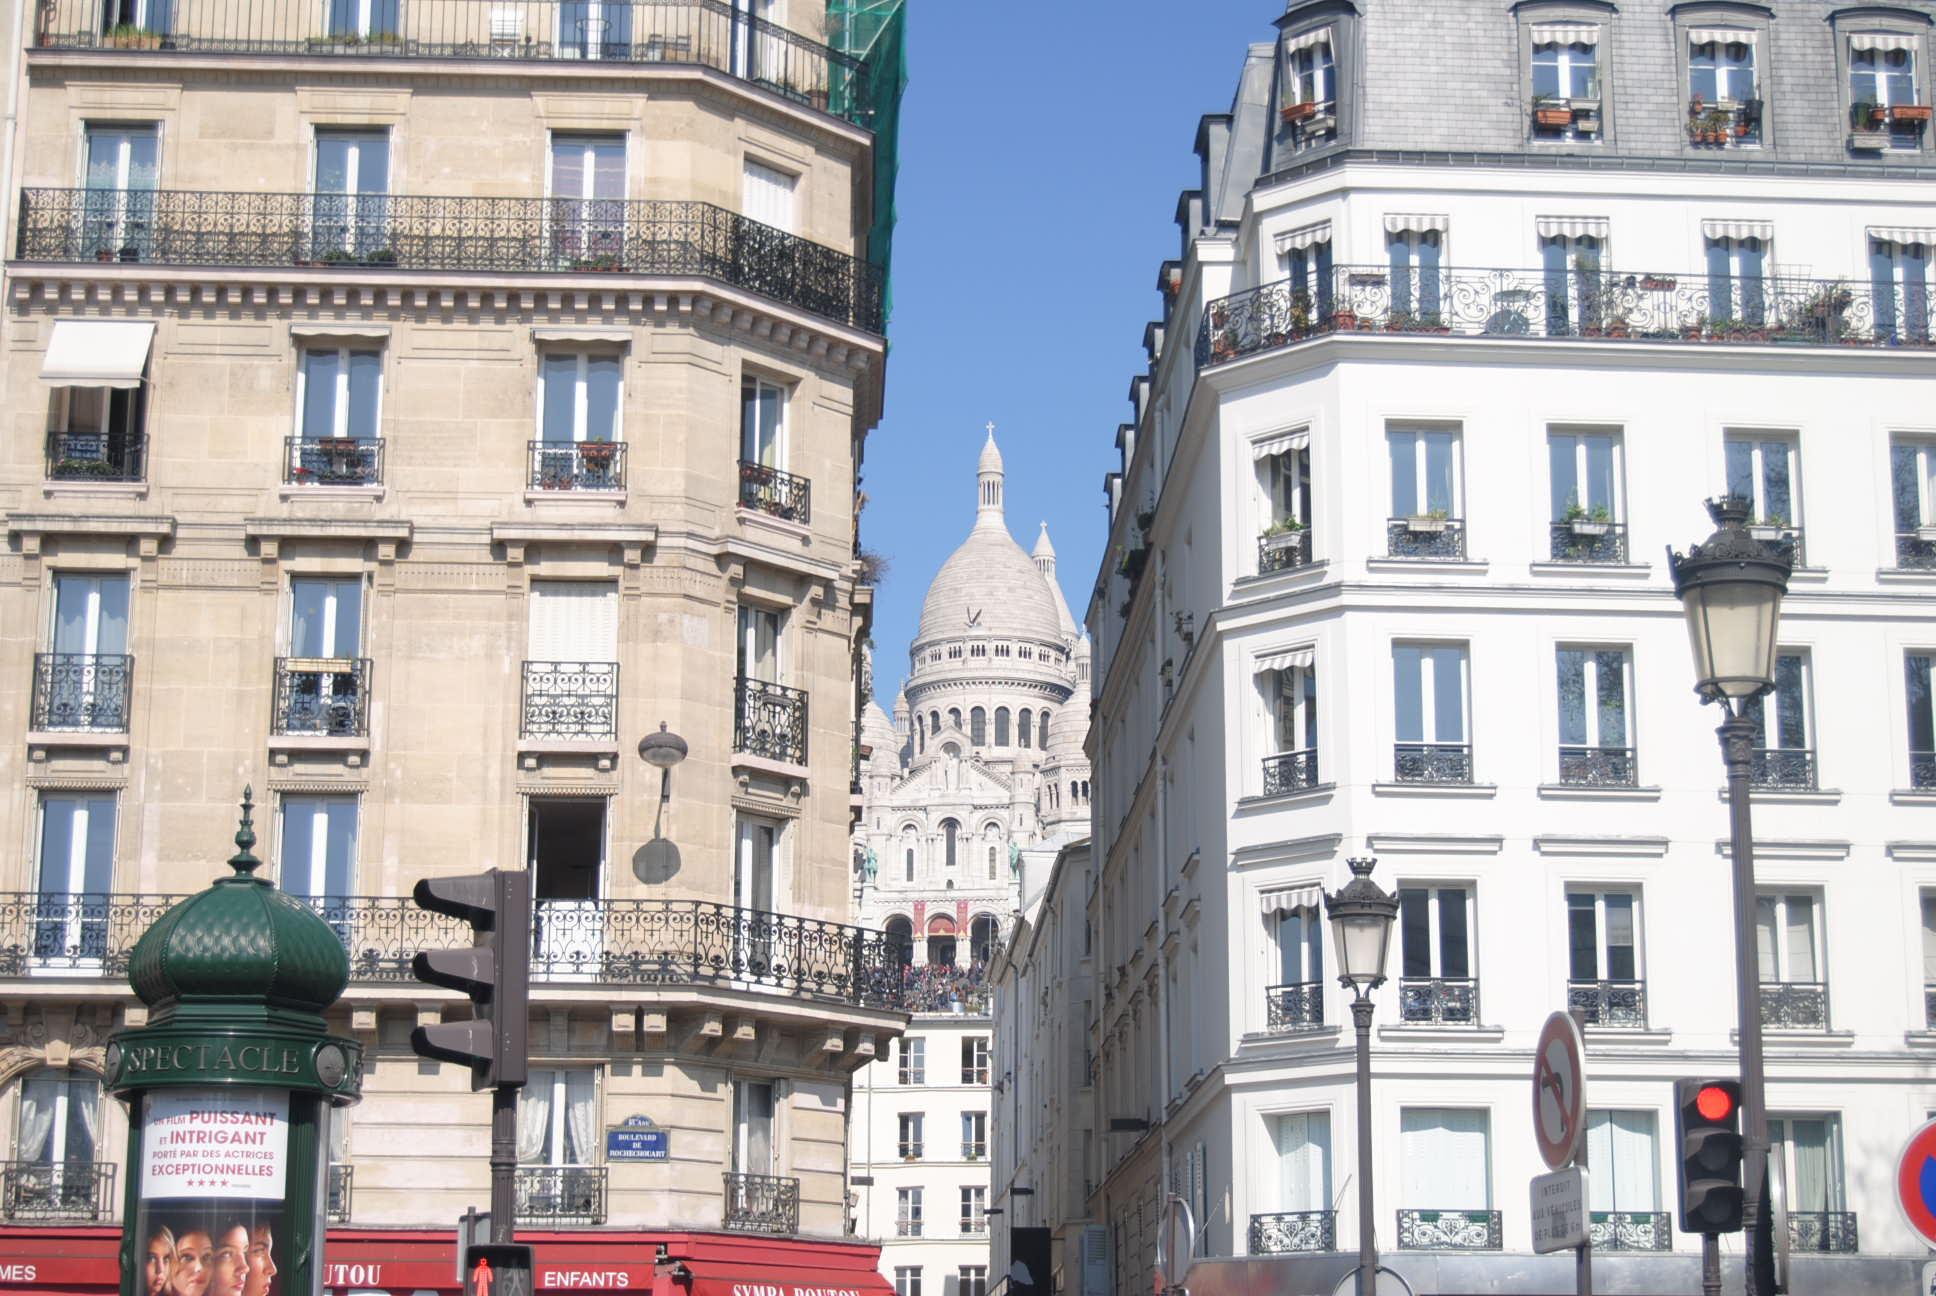 paris hotel review hotel avalon close to gare du nord 75010 my parisian lifemy parisian life. Black Bedroom Furniture Sets. Home Design Ideas